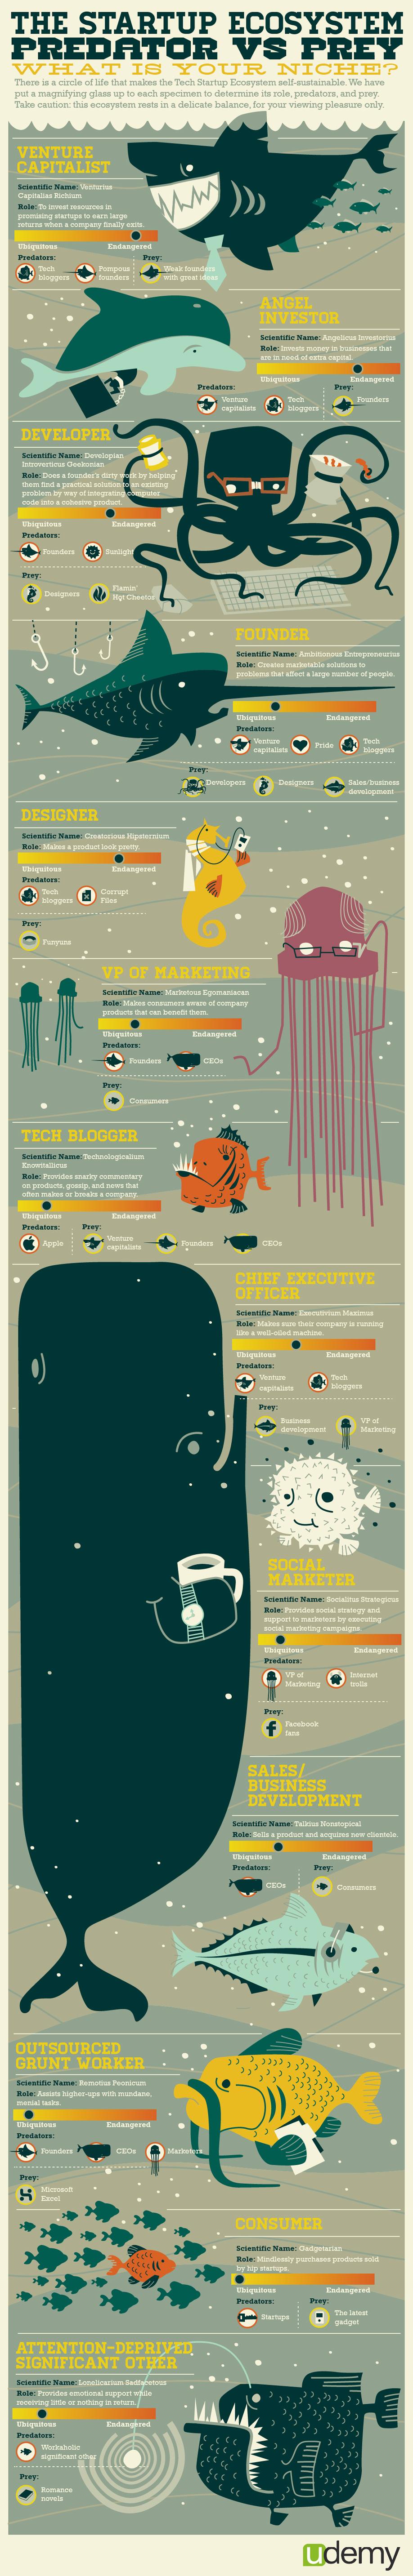 Infographic: Startup Ecosystem: Predator vs. Prey